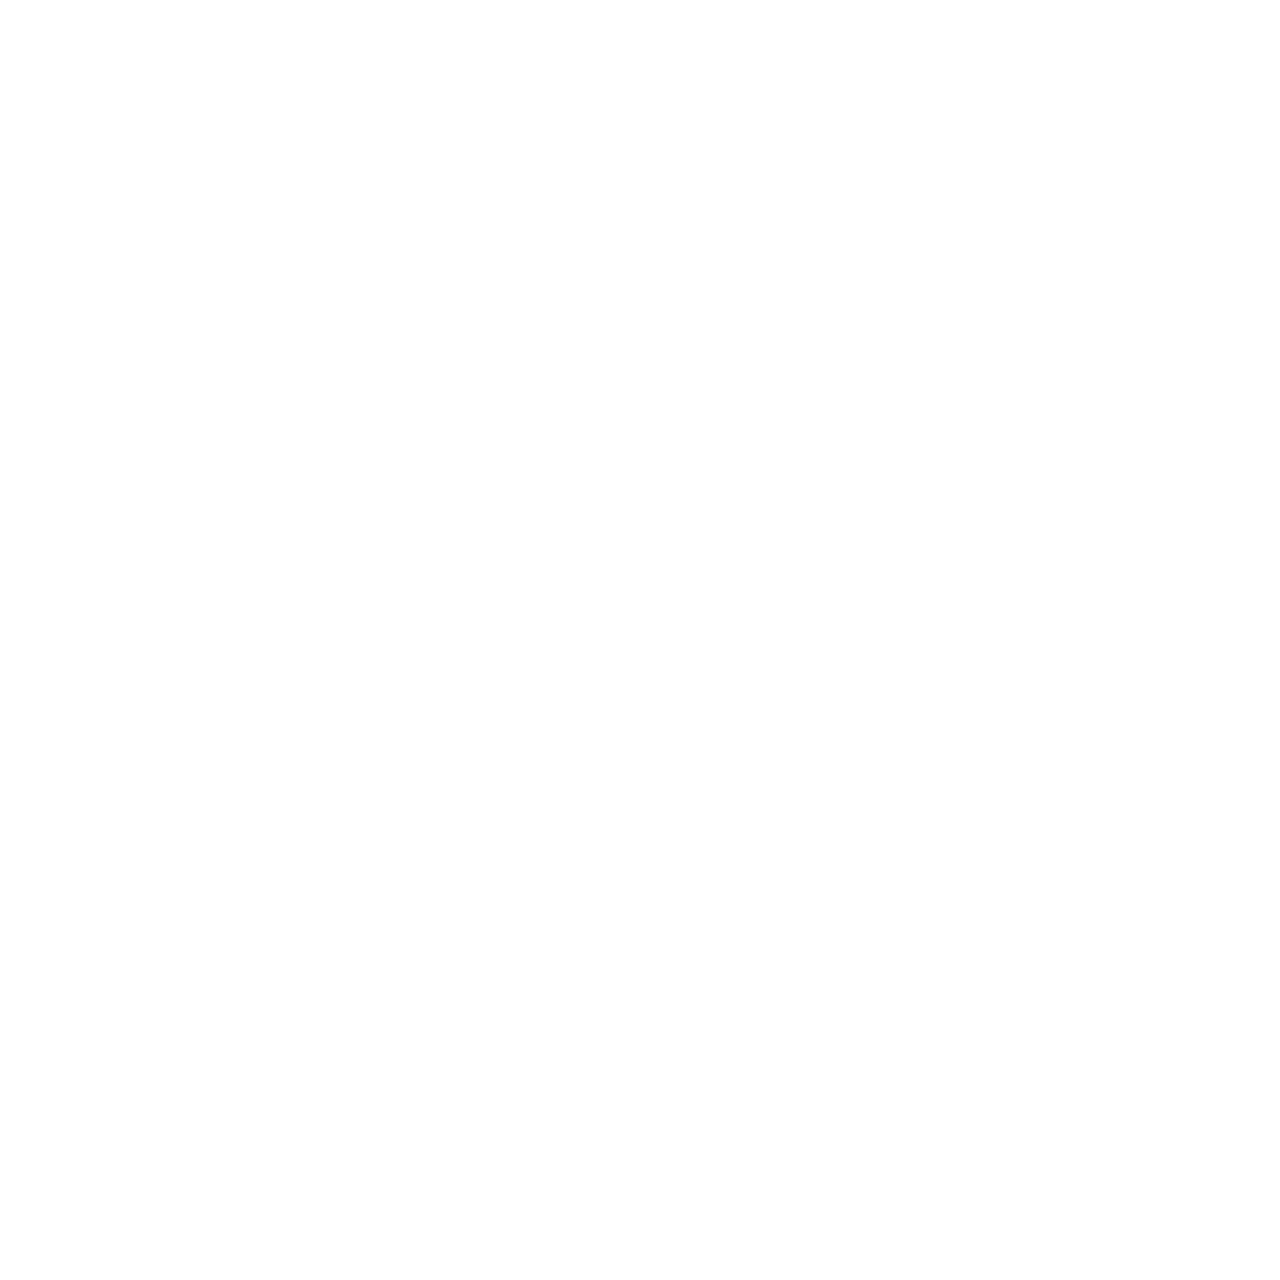 Алюкобонд 421 белый 8807 ARABOND (усиленный)